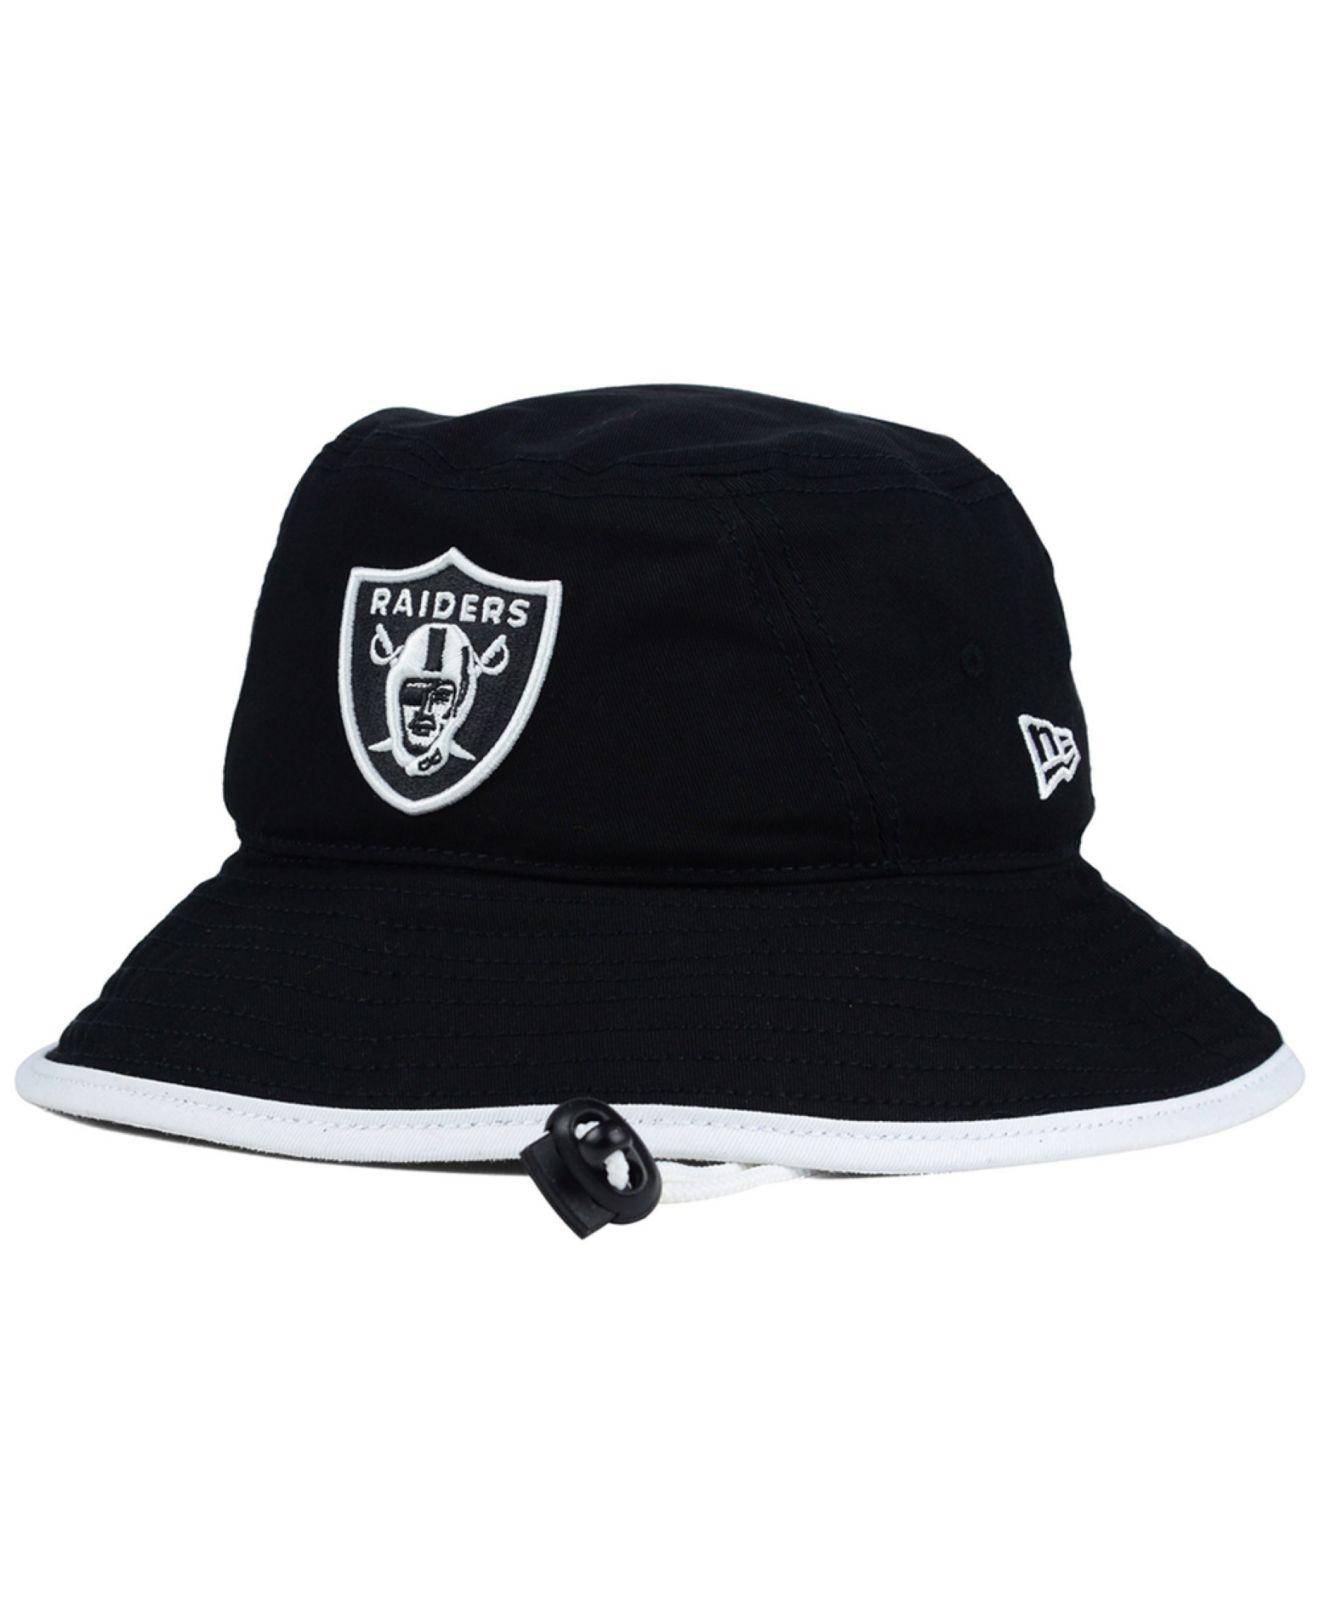 Lyst - KTZ Oakland Raiders Nfl Black White Bucket Hat in Black caf7088cd